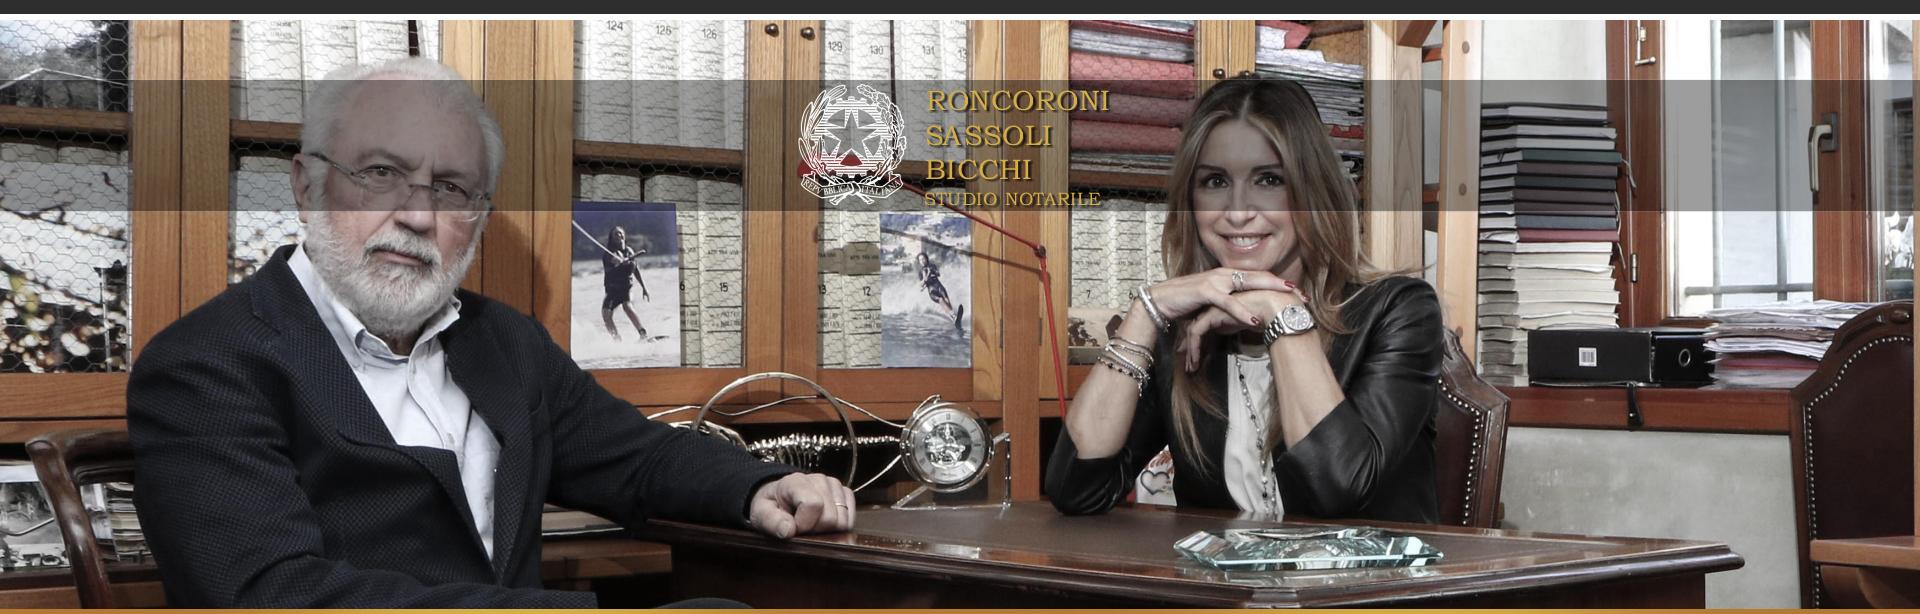 Contattaci - © Studio Notarile Roncoroni Sassoli Bicchi ...